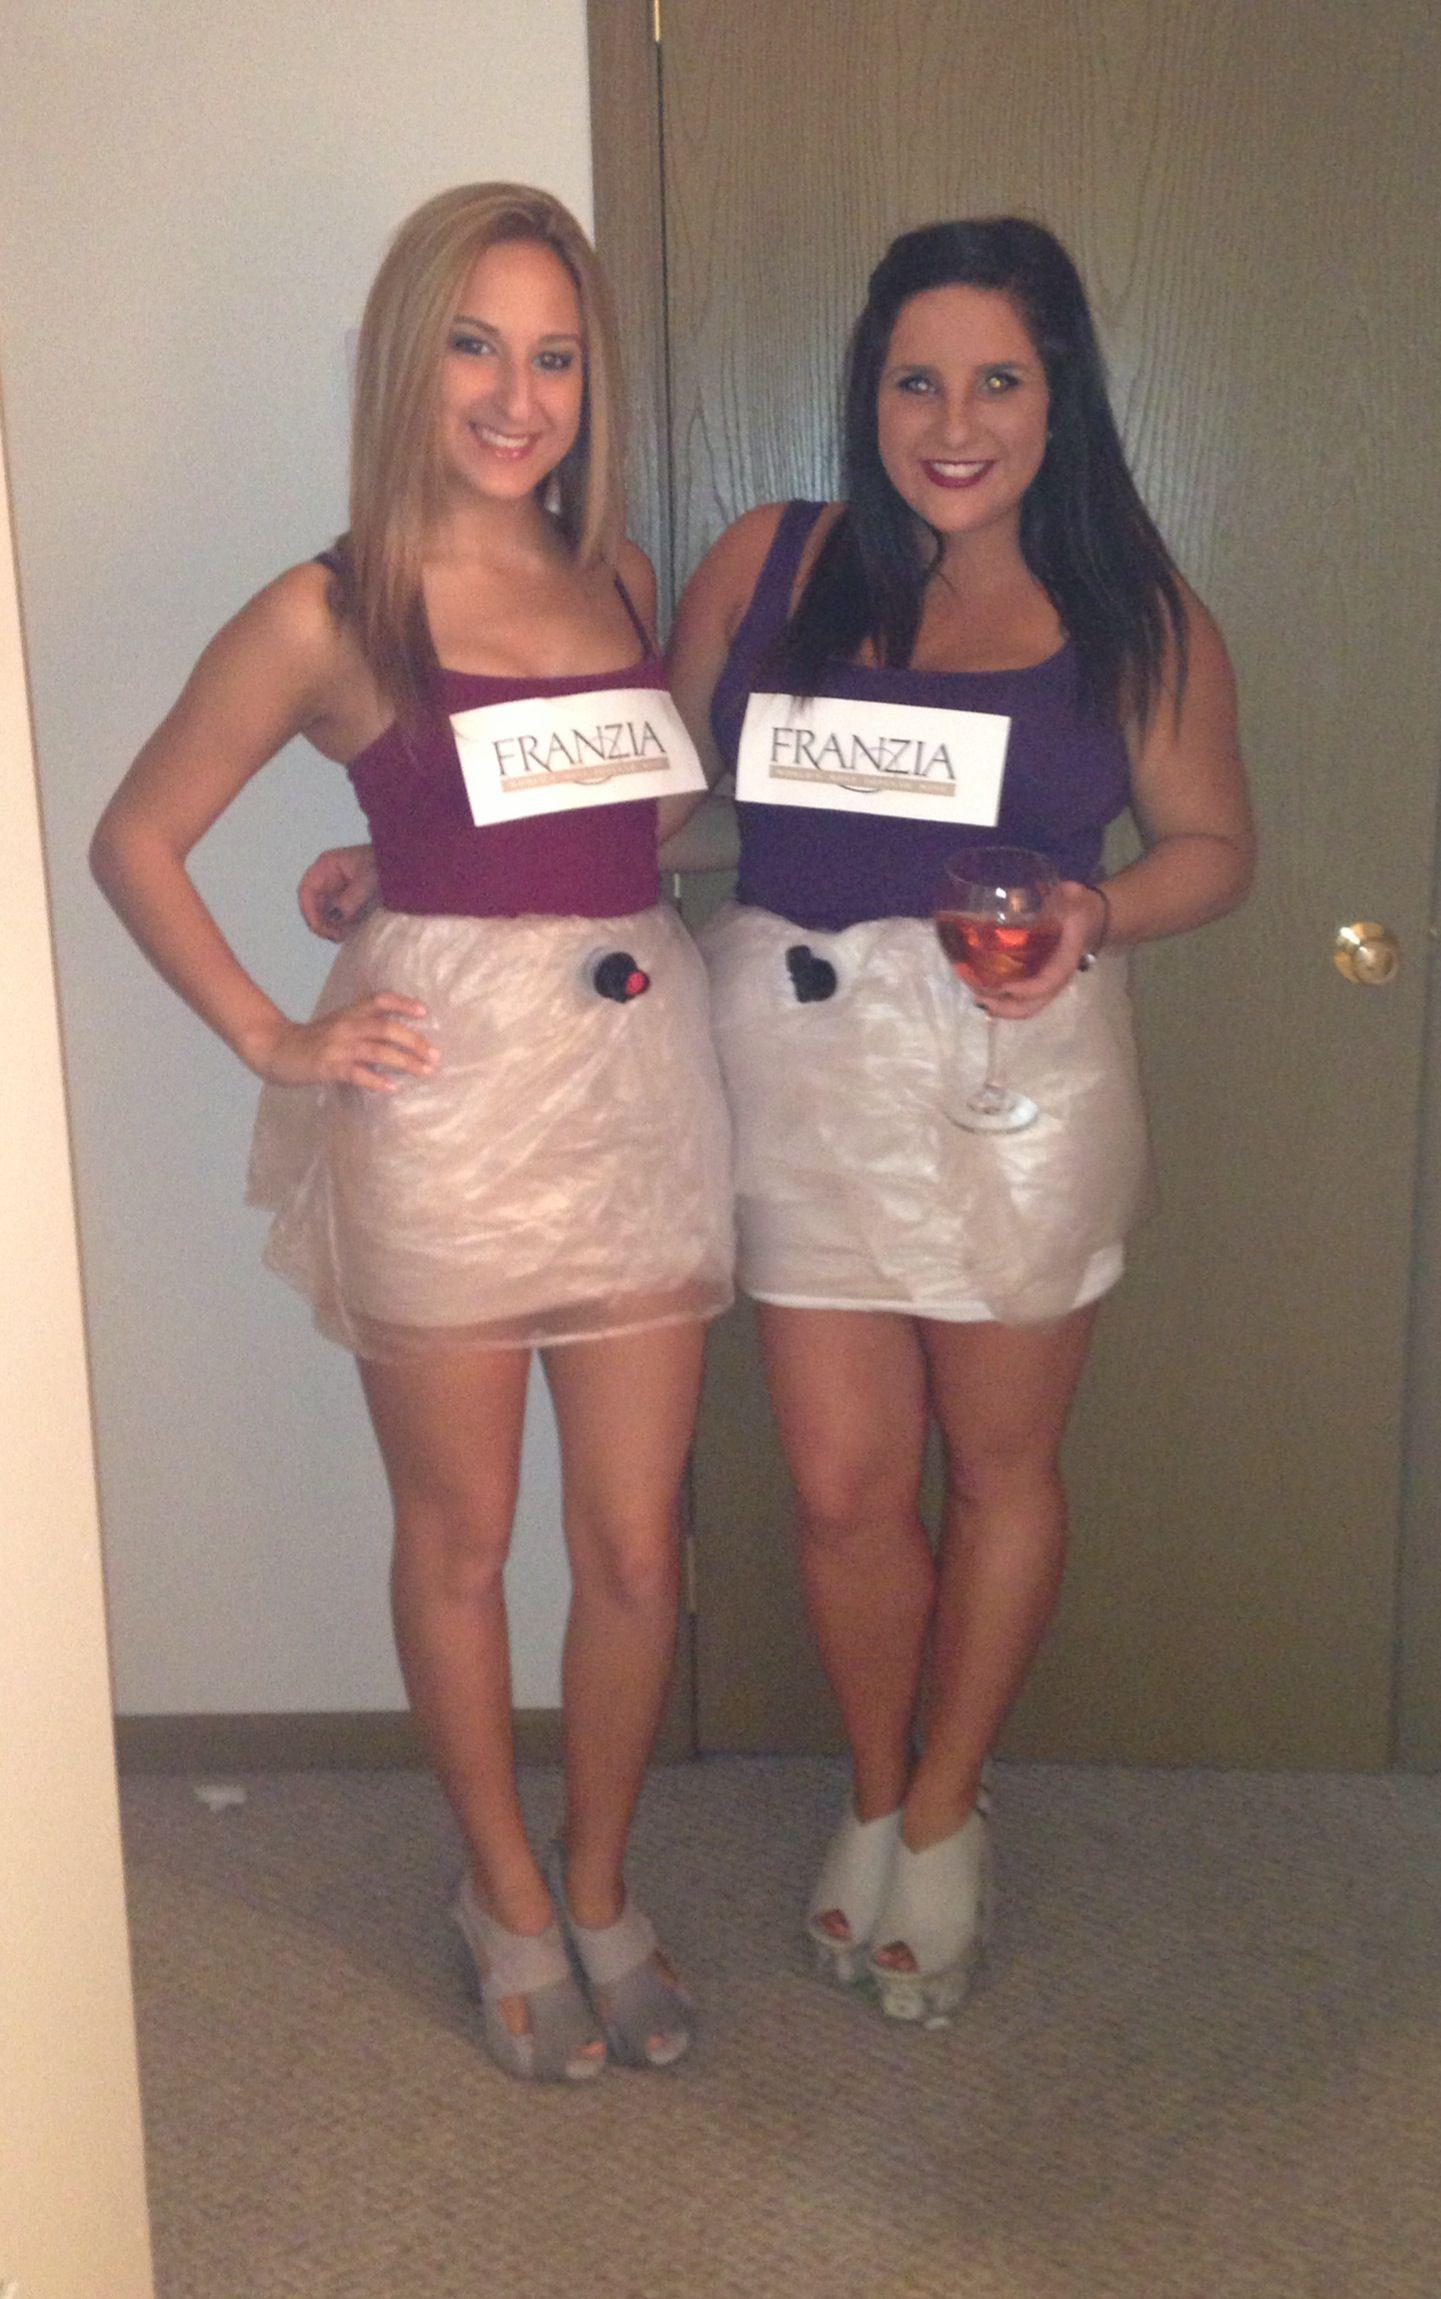 franzia wine box halloween costume   wallsviews.co